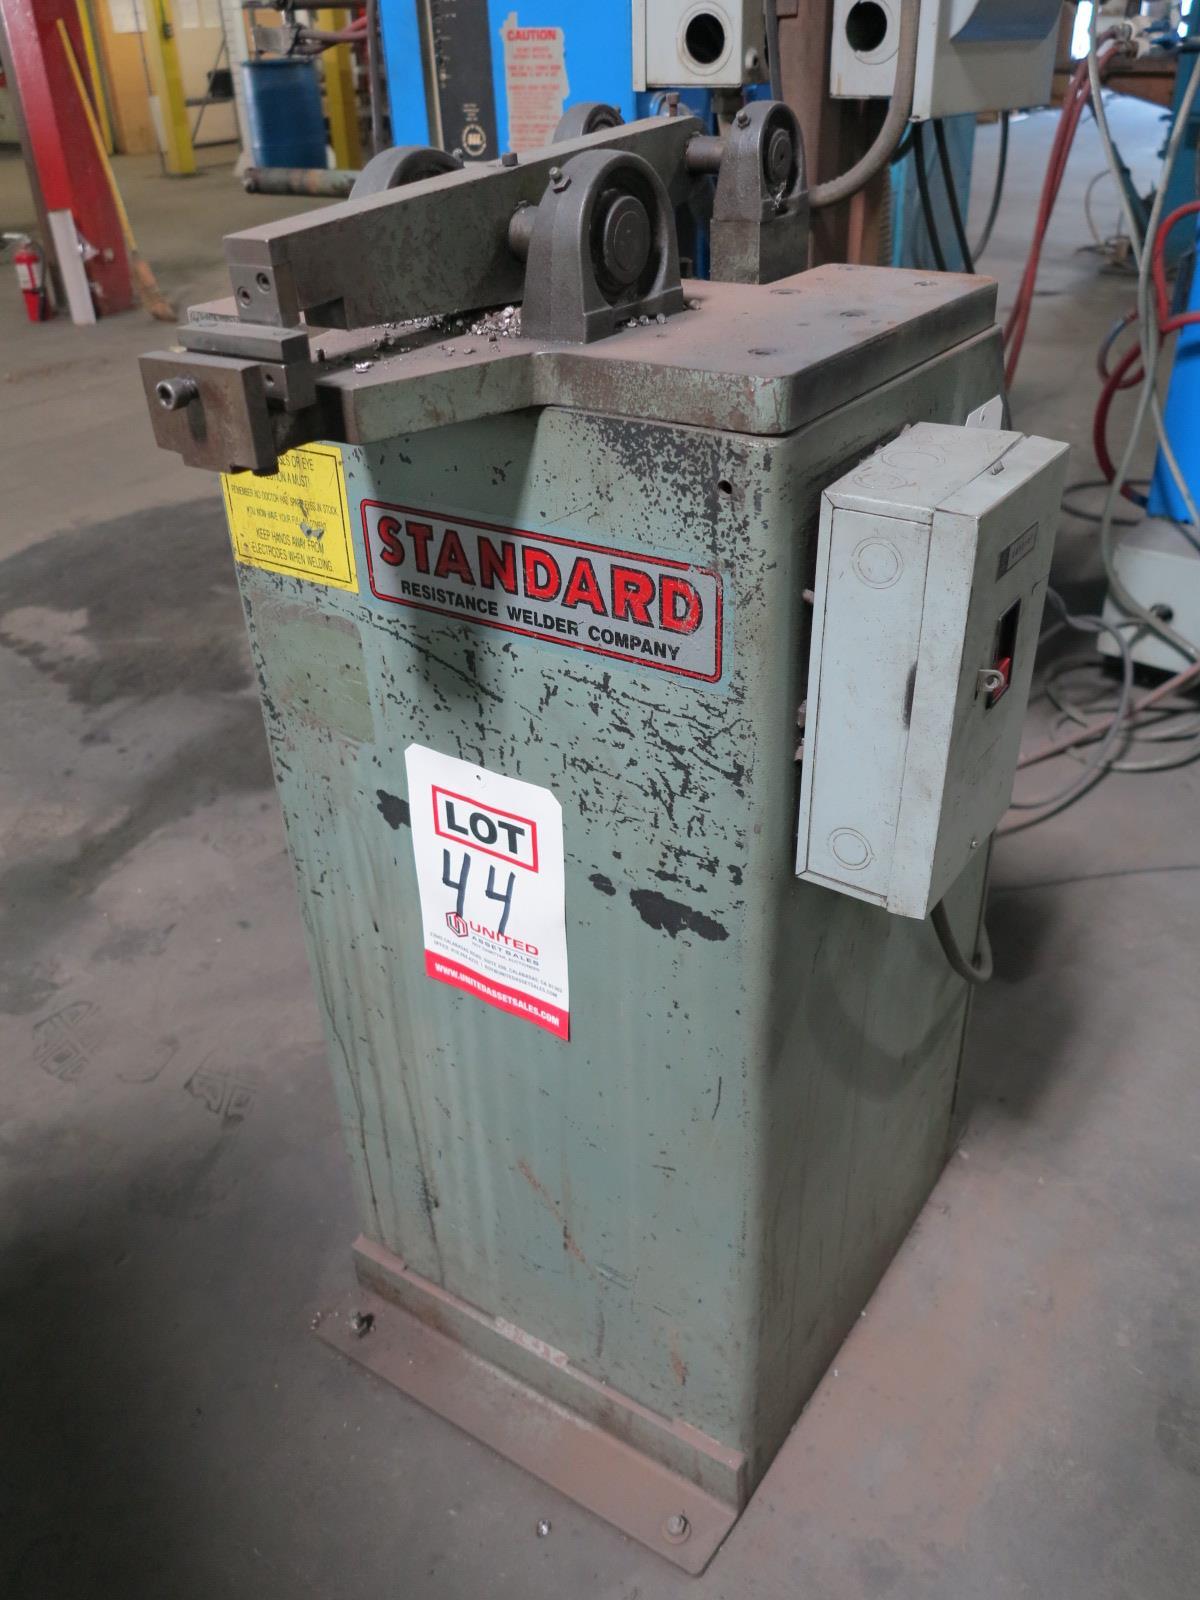 STANDARD WIRE NIBBLER, STYLE: WIRE, S/N 2393